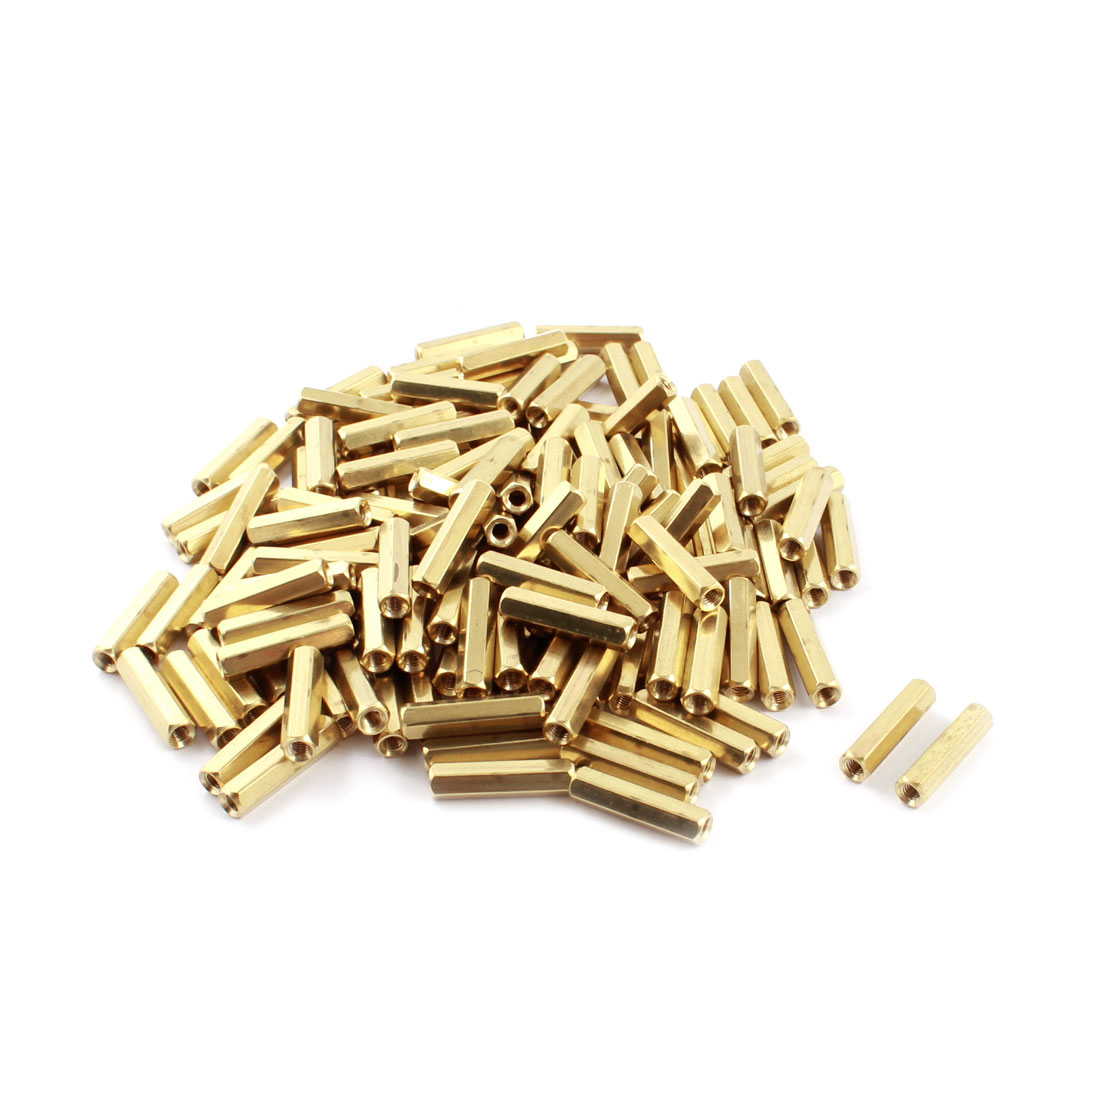 150 Pcs M3 x 20mm Female Thread Dual Ends Gold Tone Pillar PCB Standoff Hexagonal Nut Spacer